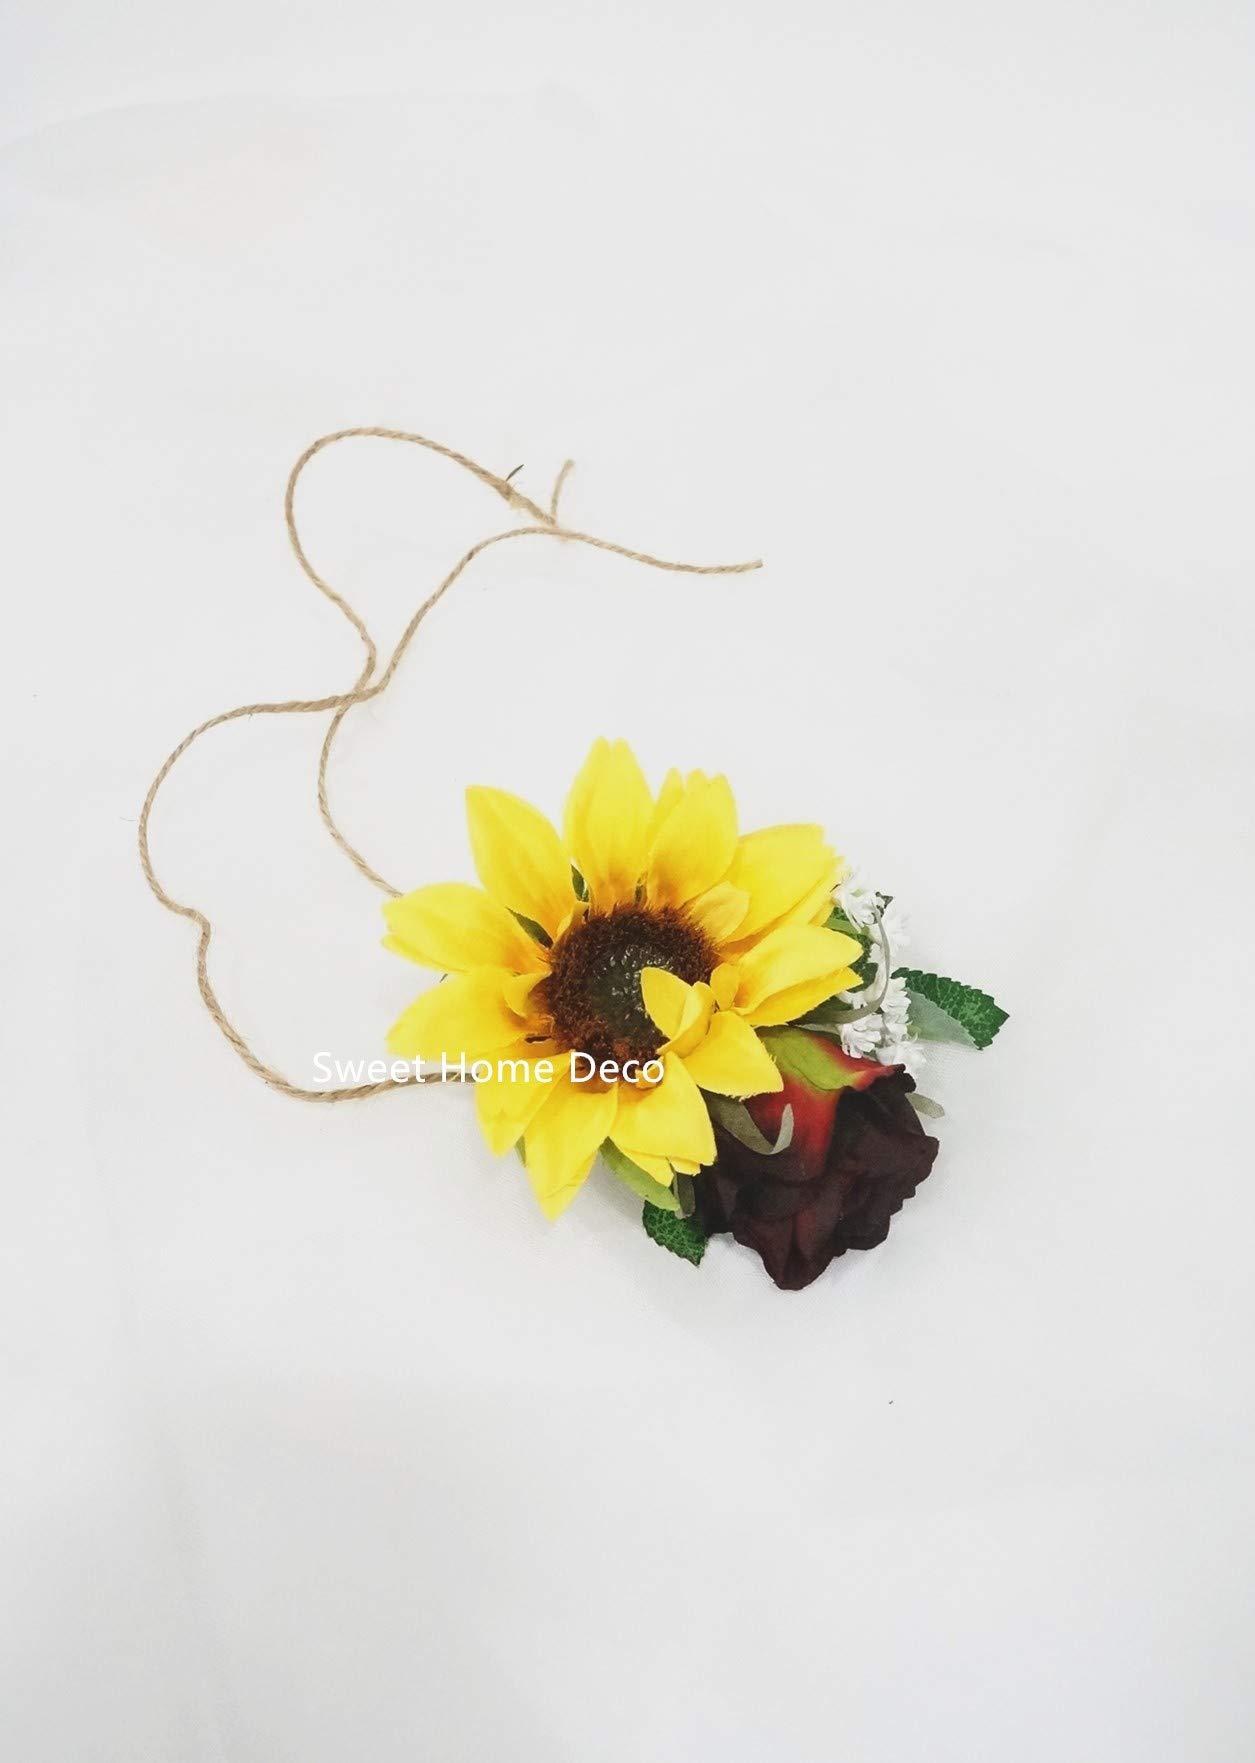 silk flower arrangements sweet home deco silk sunflower burgundy rose baby's breath mixed wedding bridal bridesmaid bouquet boutonniere corsage package for autumn (yellow/burgundy-wrist corsage)